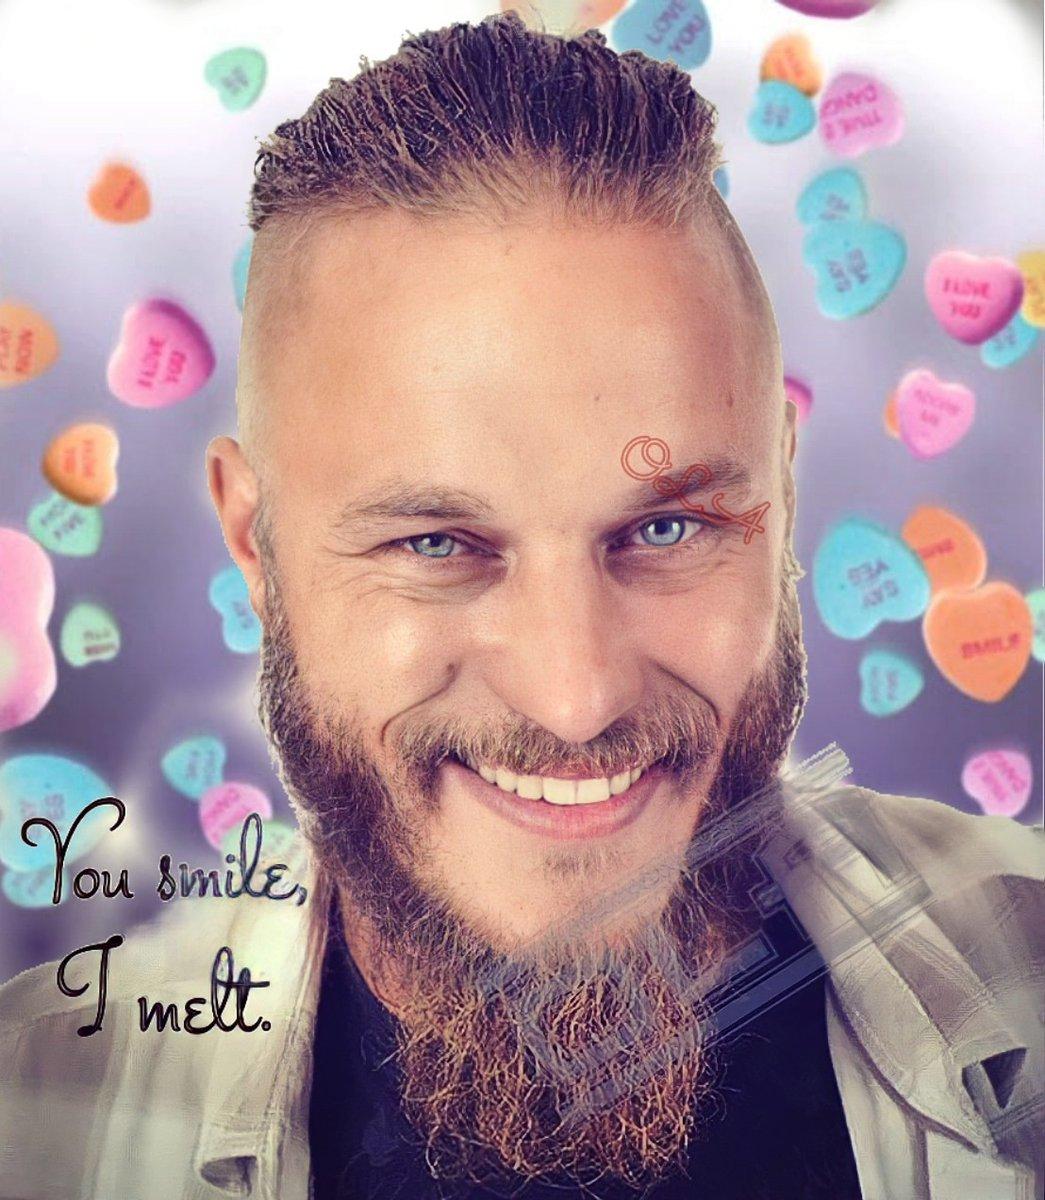 #fimmeliciousfriday my gorgeous hubby #mysexyviking #travisfimmel #vikings ilysm sweet darling of mine 💙💋💘 Travis Fimmel https://t.co/AzQe8pTRLV